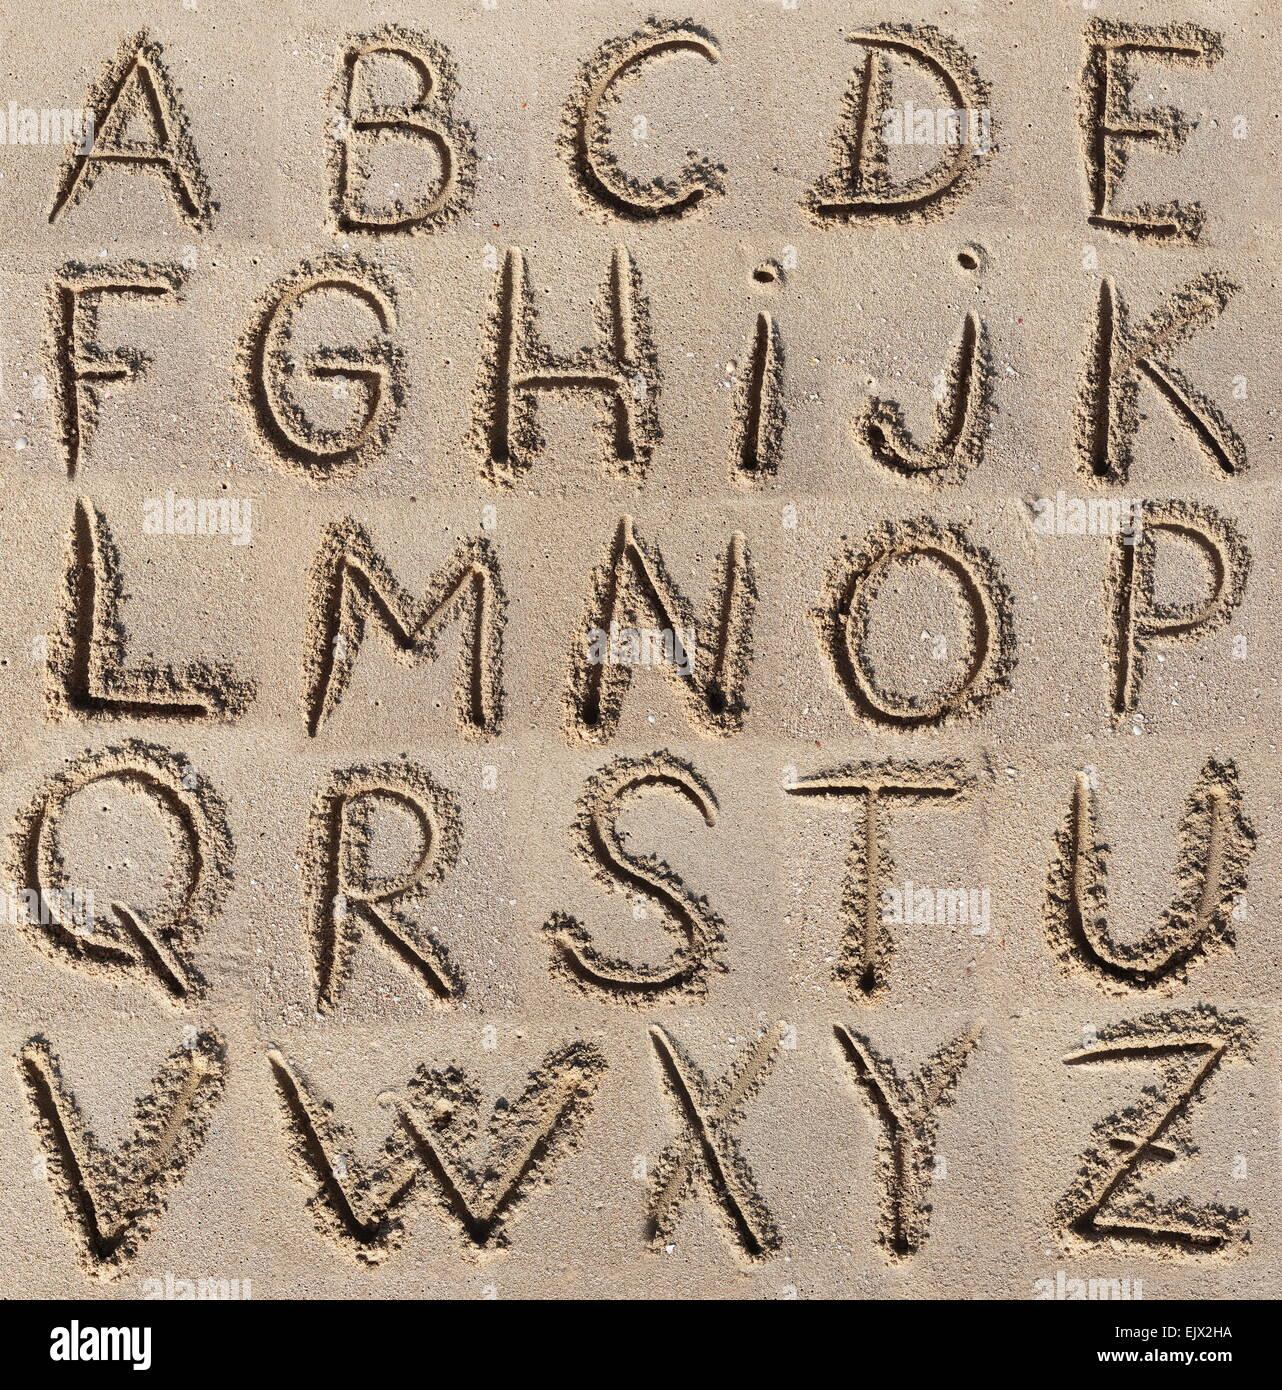 Alphabet (ABC) written on sand. - Stock Image